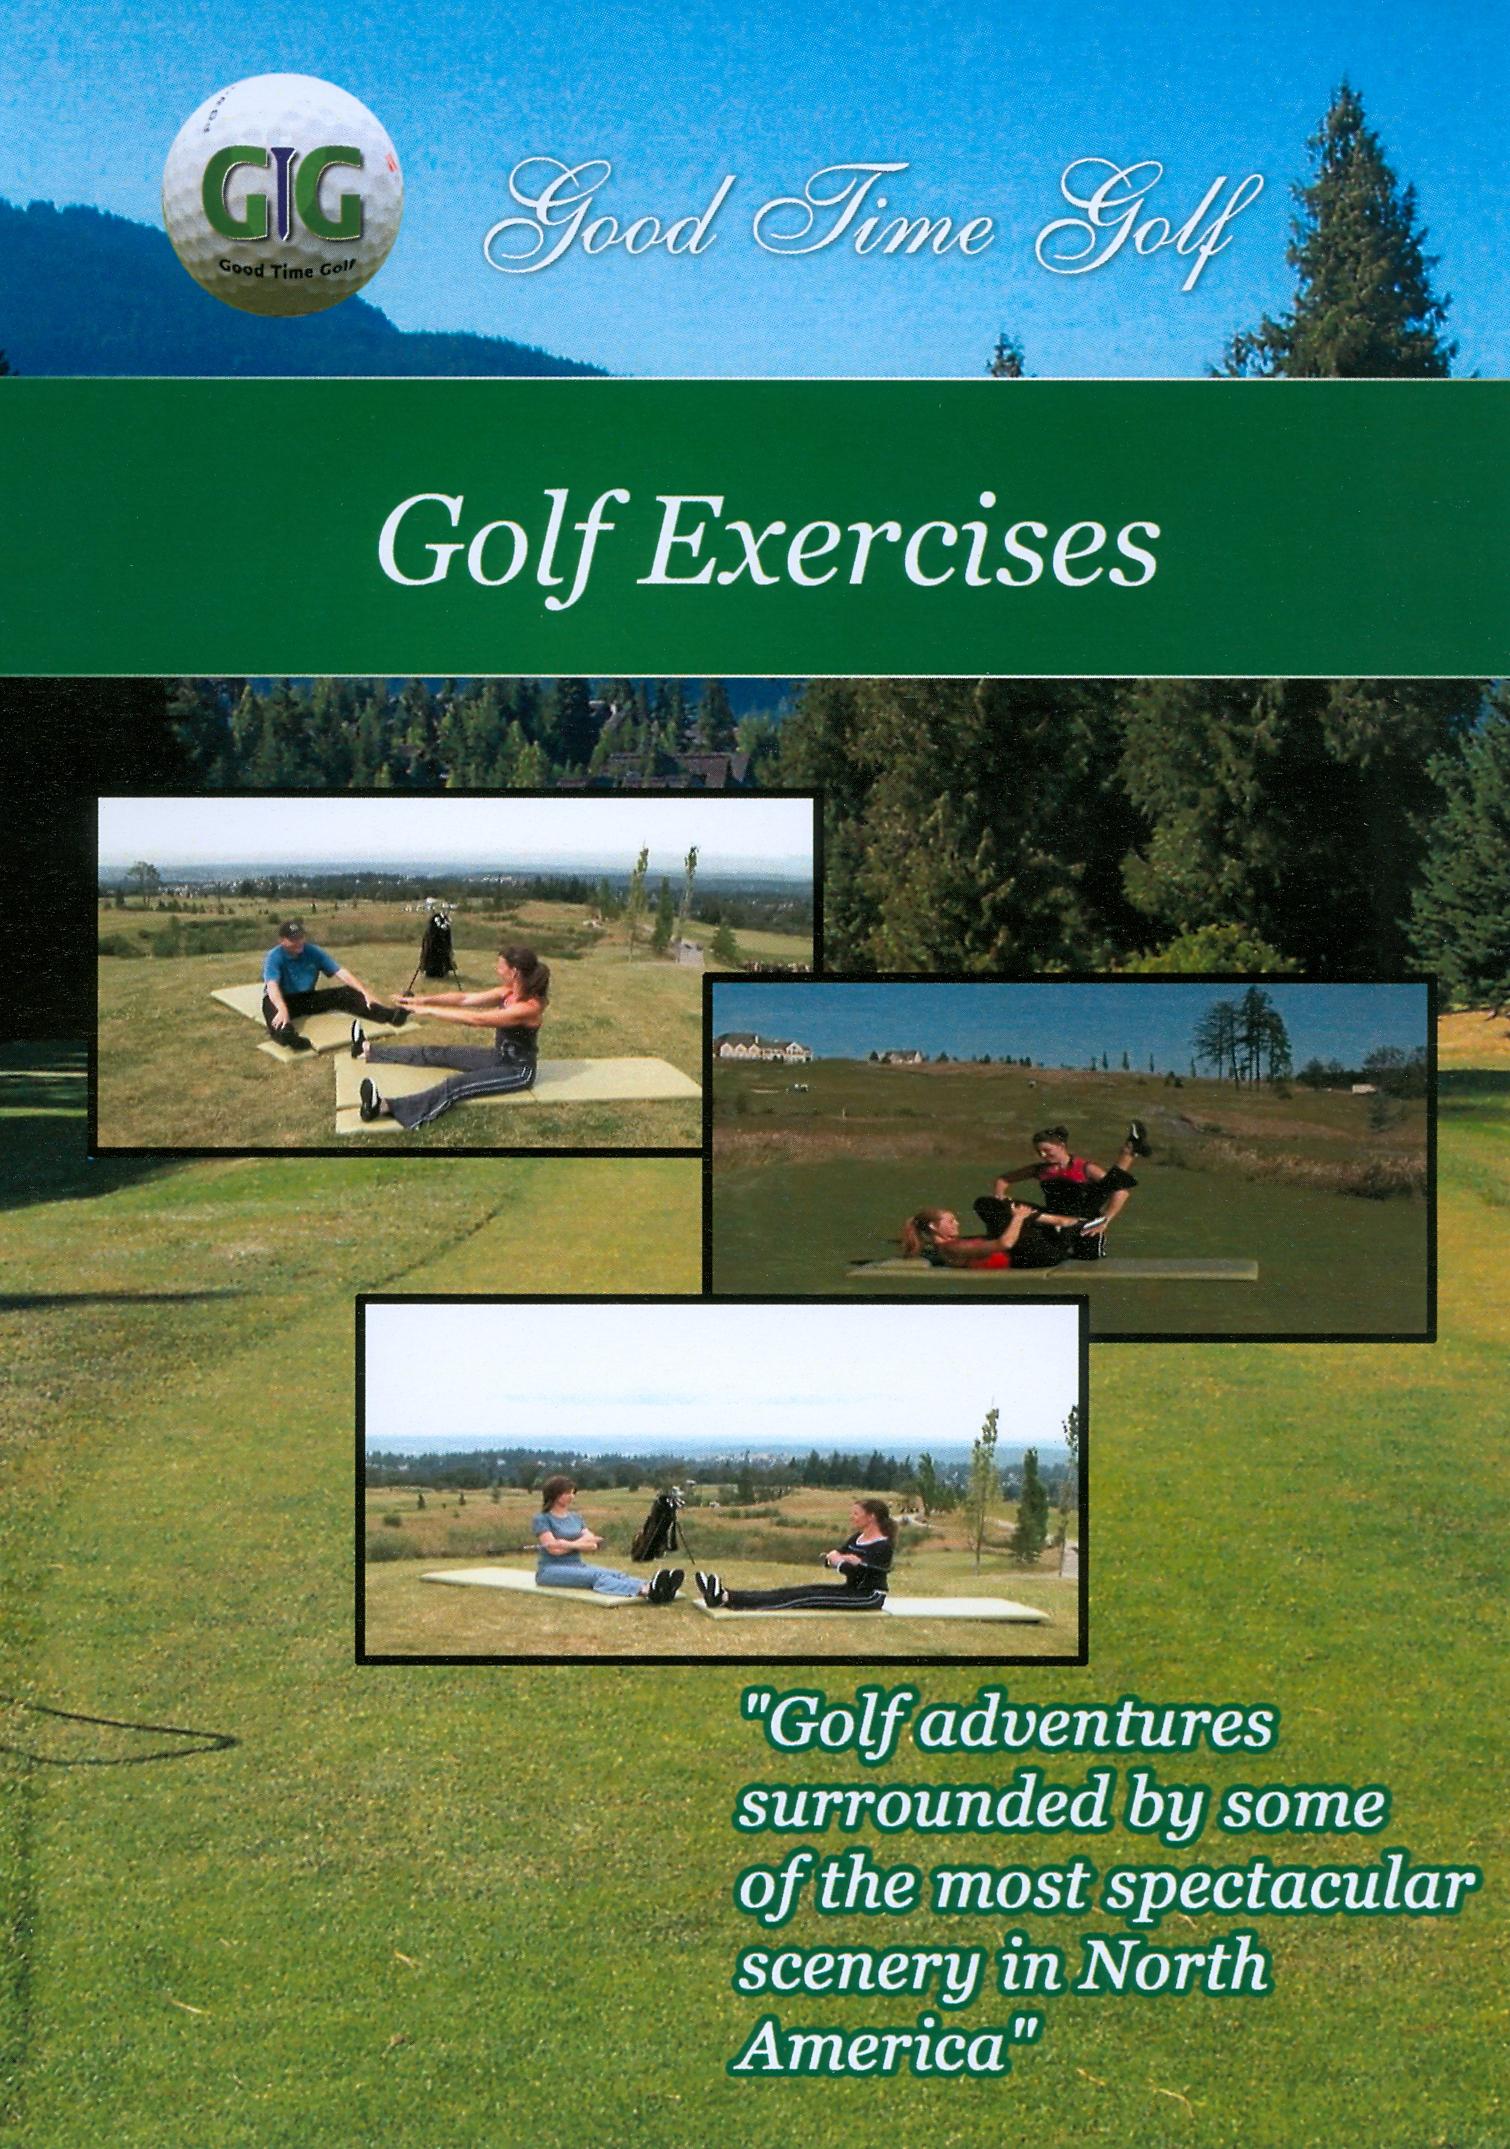 Good Time Golf: Golf Exercises